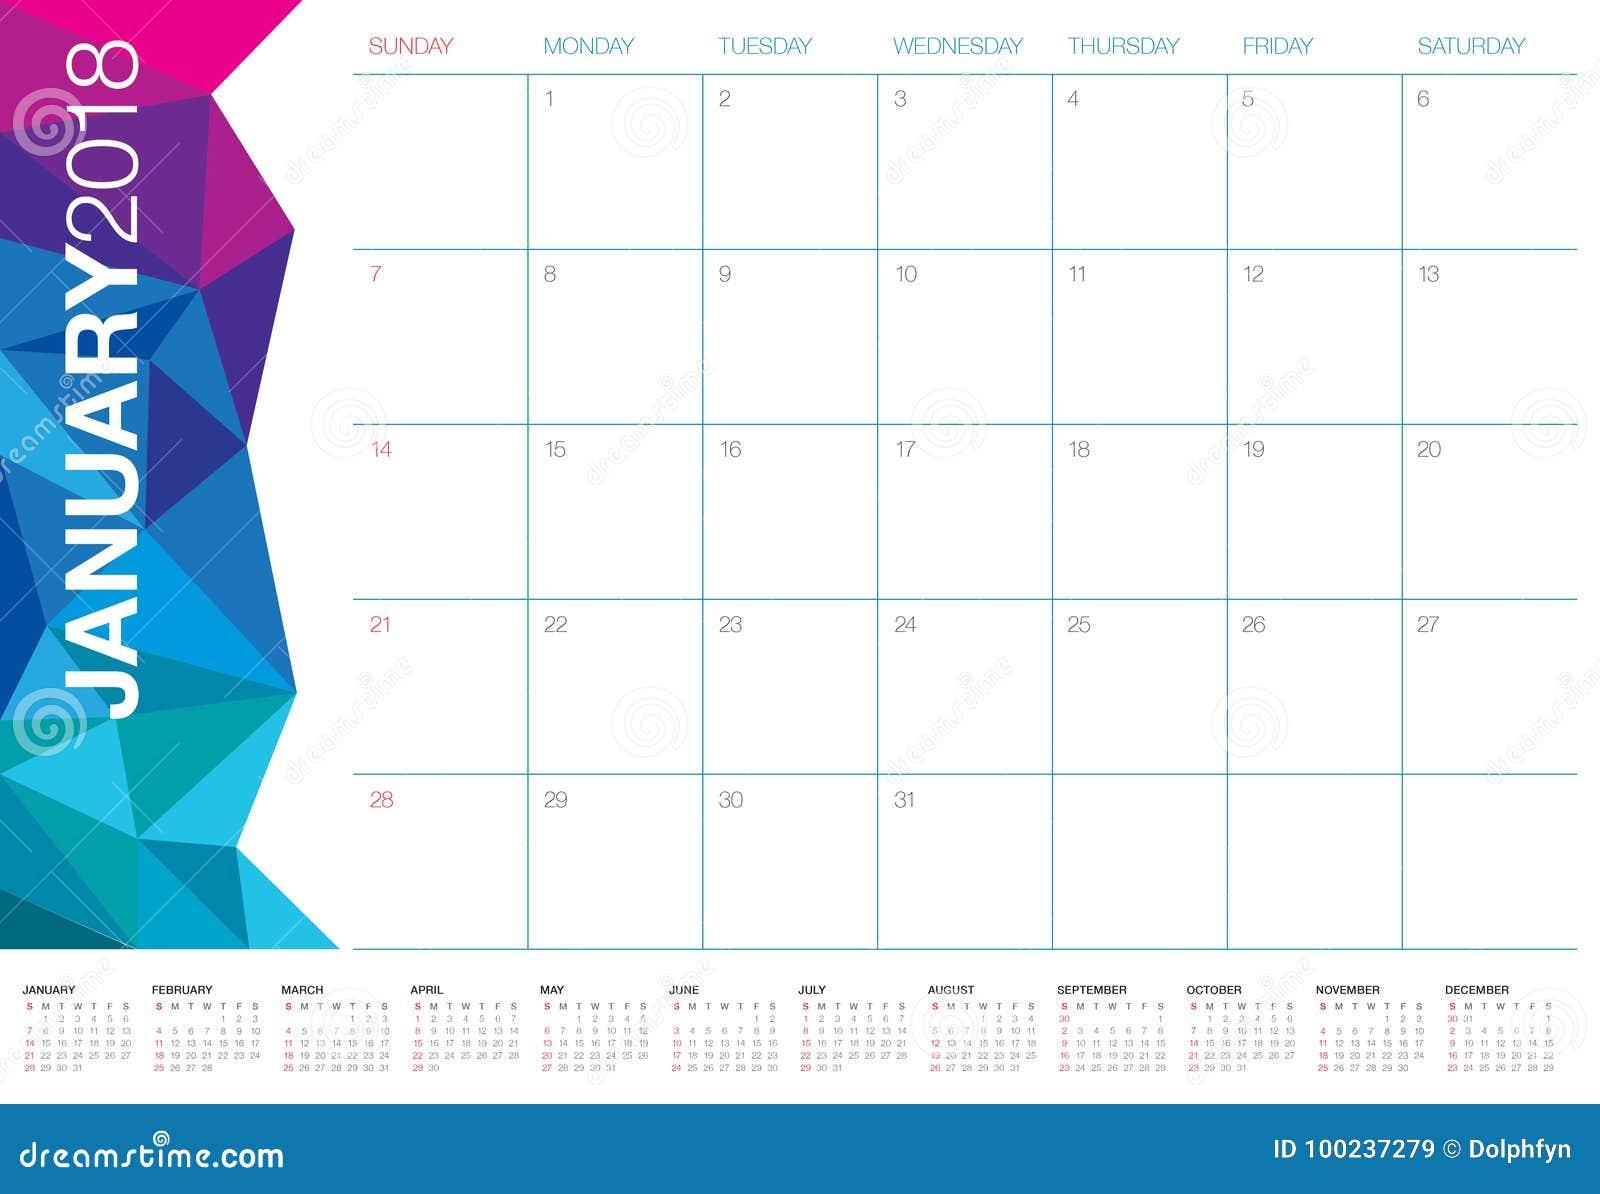 Calendar Planner Vector Free : January calendar planner vector illustration stock